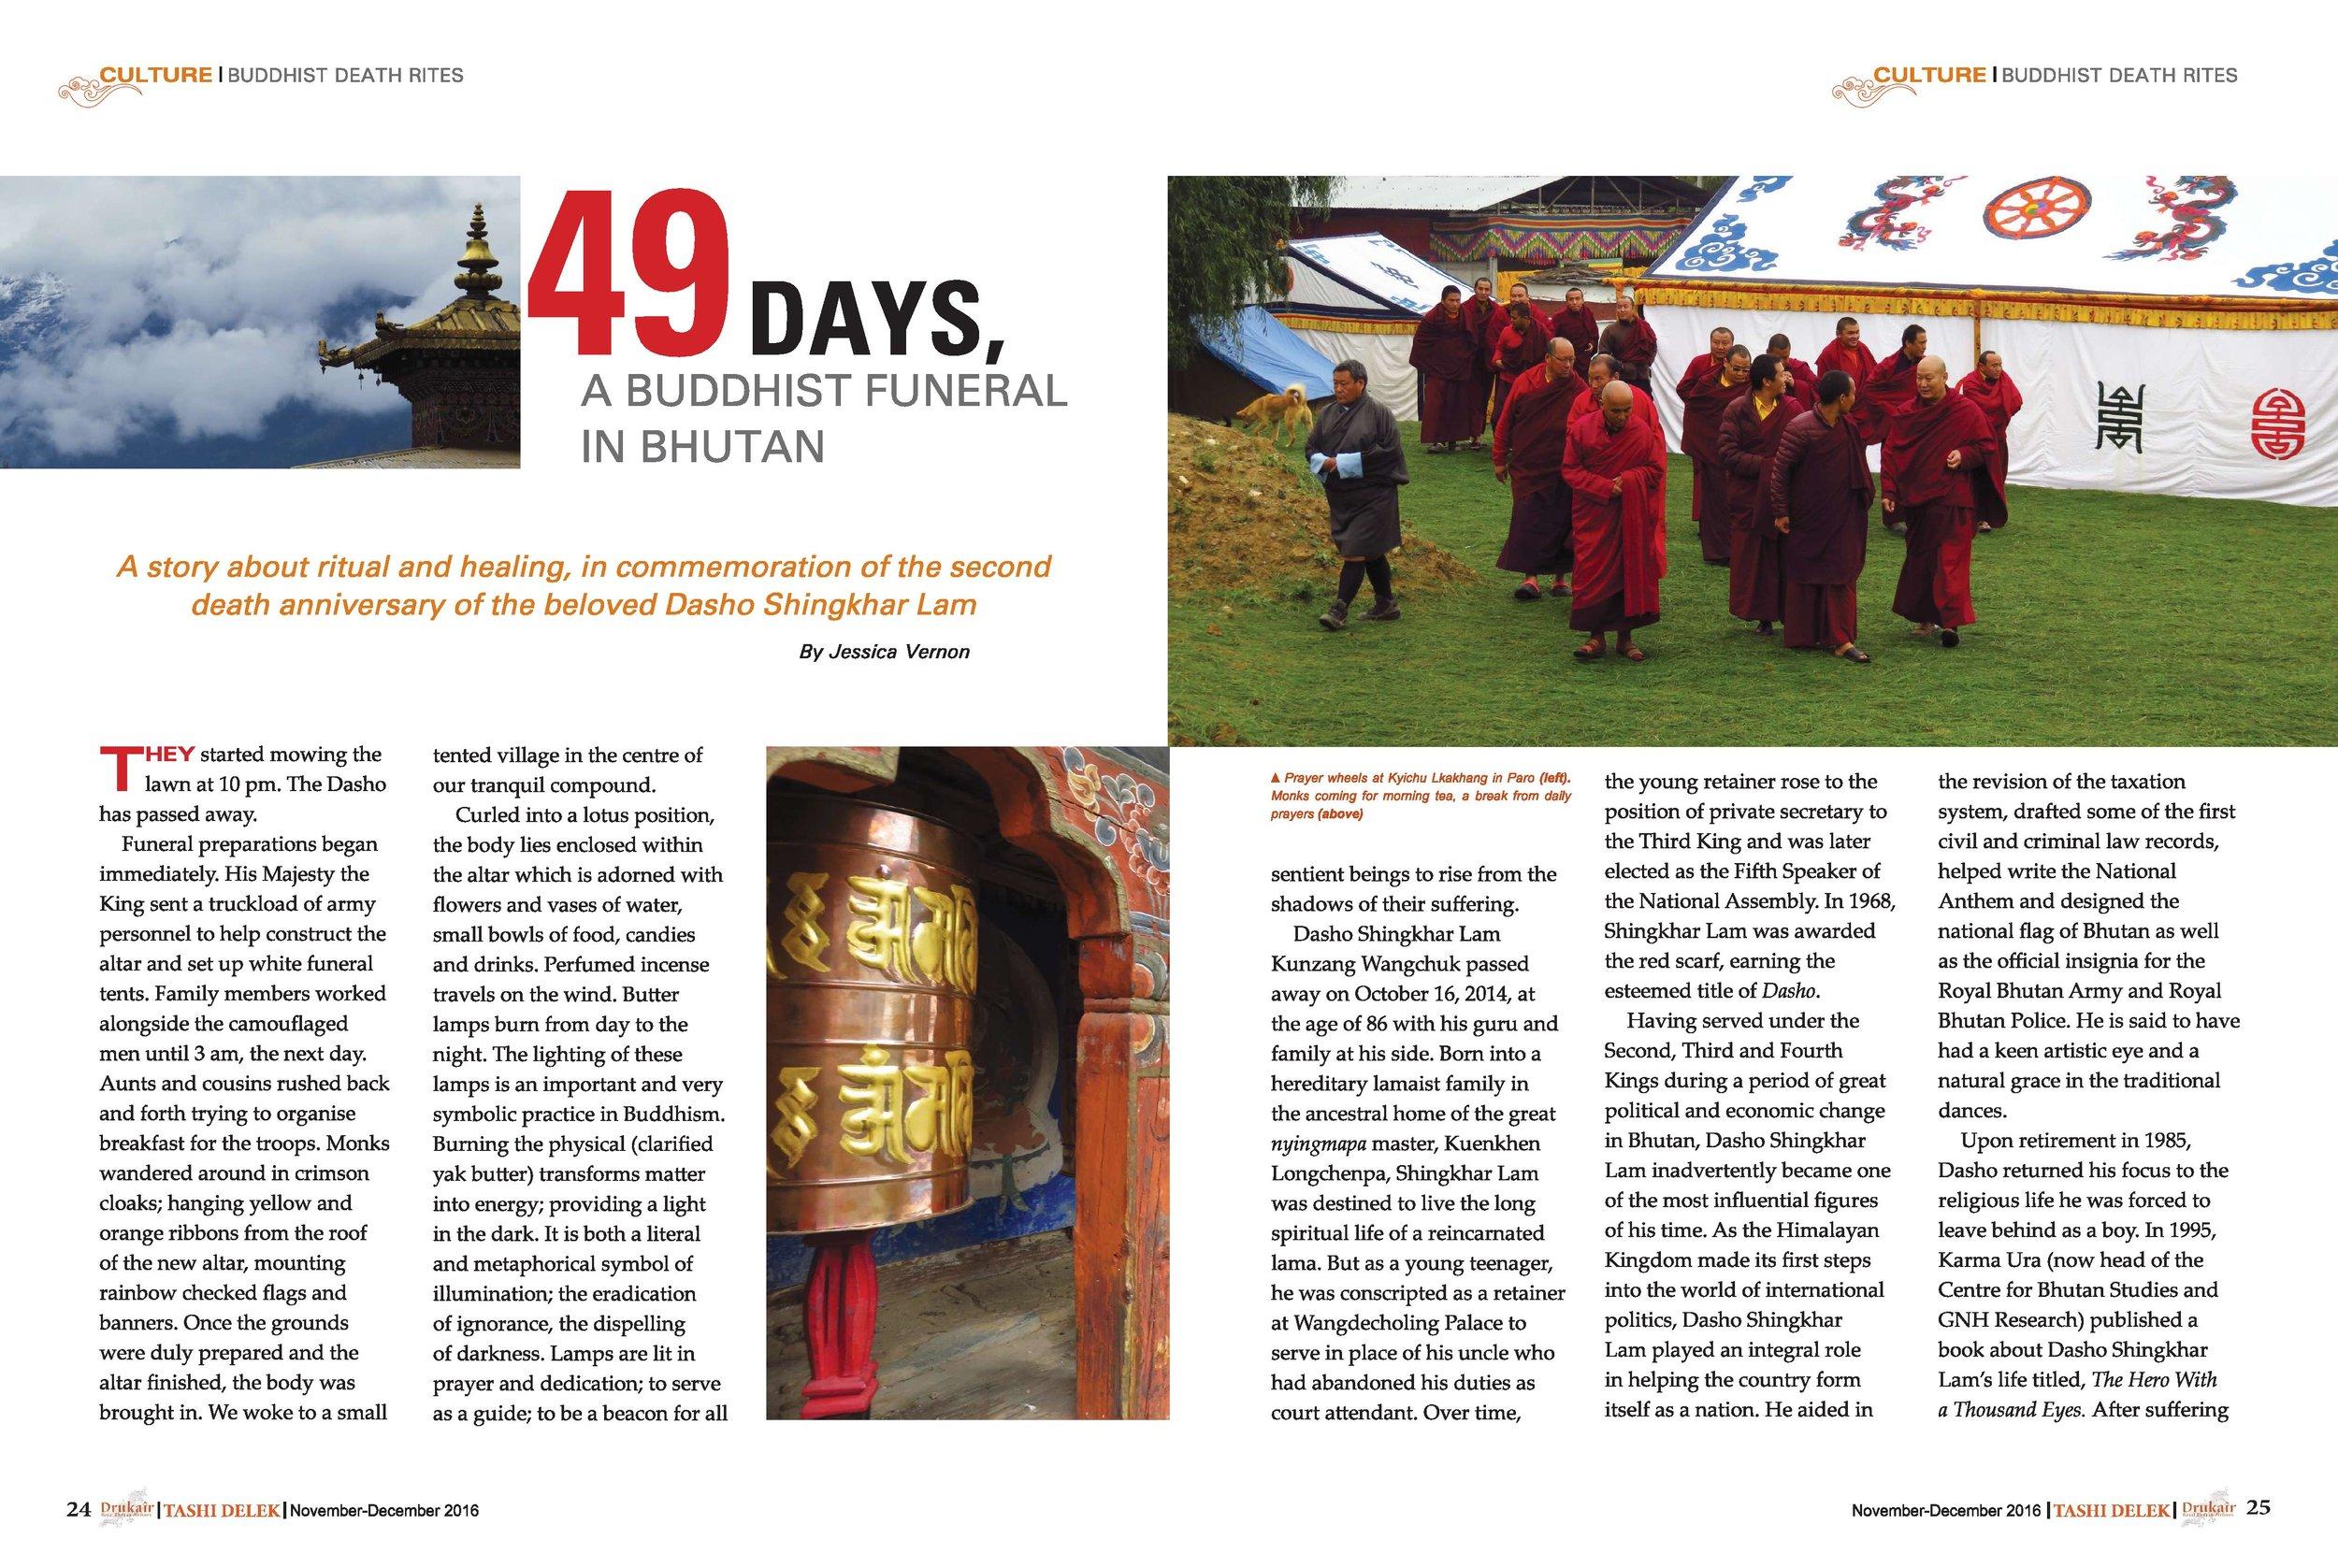 Dec. 2016: 49 Days, a Buddhist Funeral in Bhutan